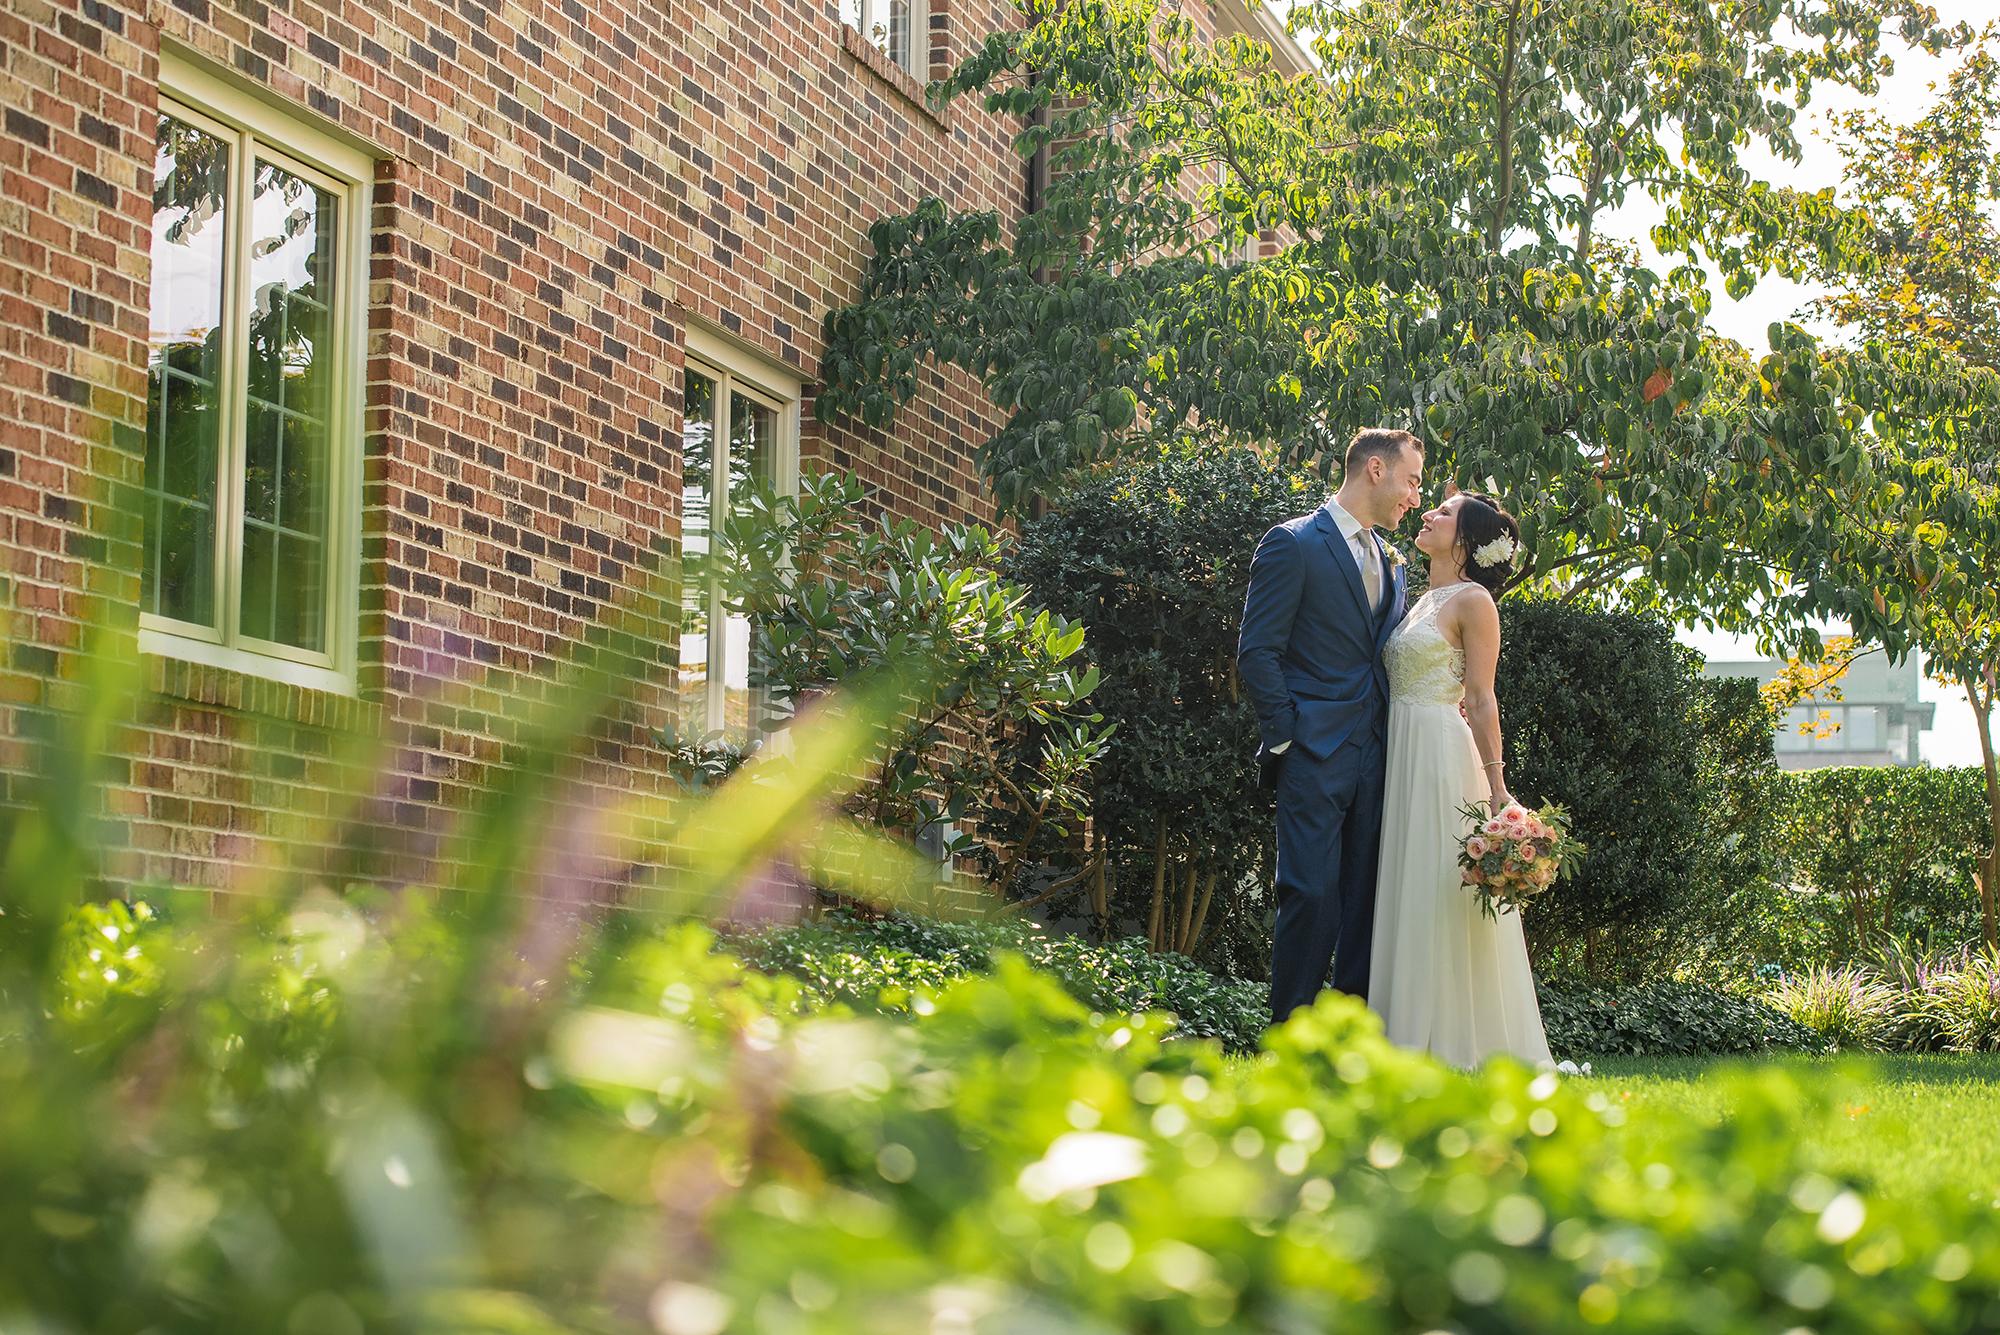 trenos-wedding-lbi-photographer-39.jpg